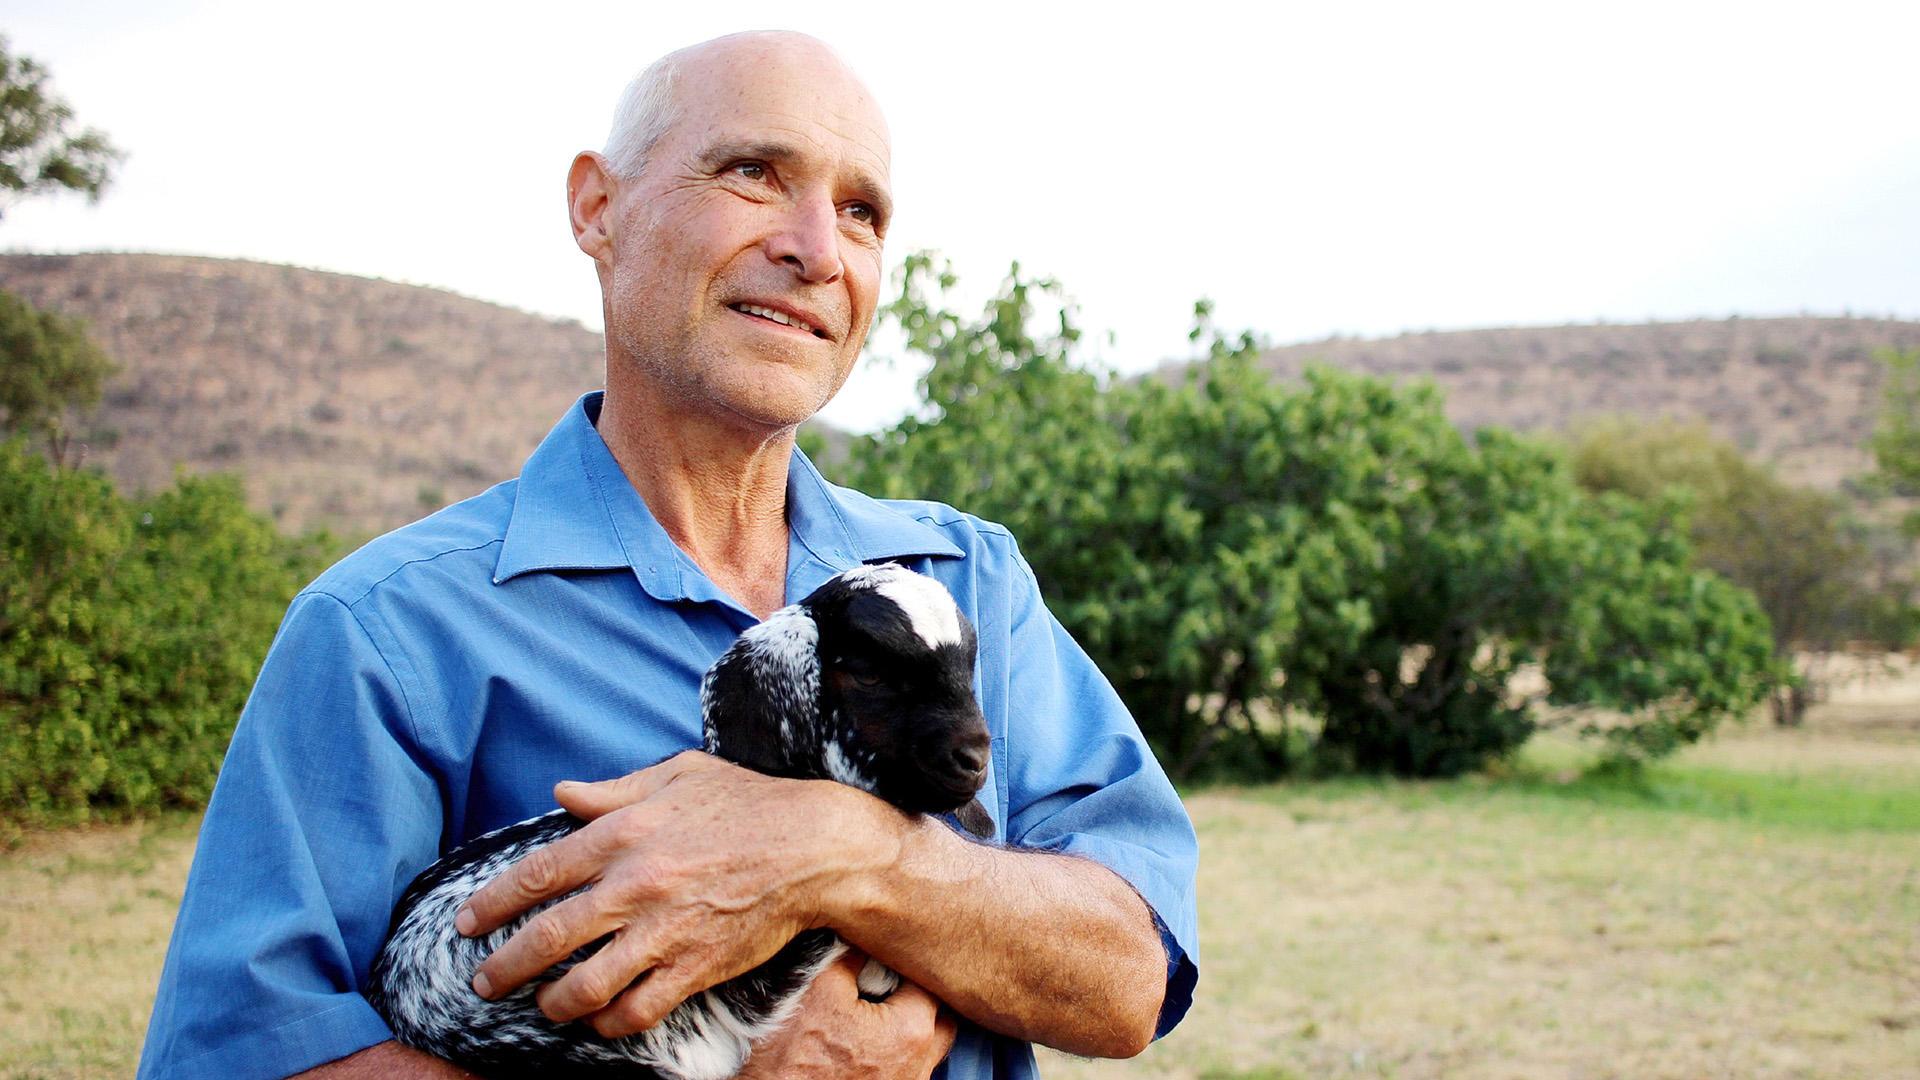 Viehzüchter Gerhard begrüßt seine Hofdamen in Südafrika | Folge 3